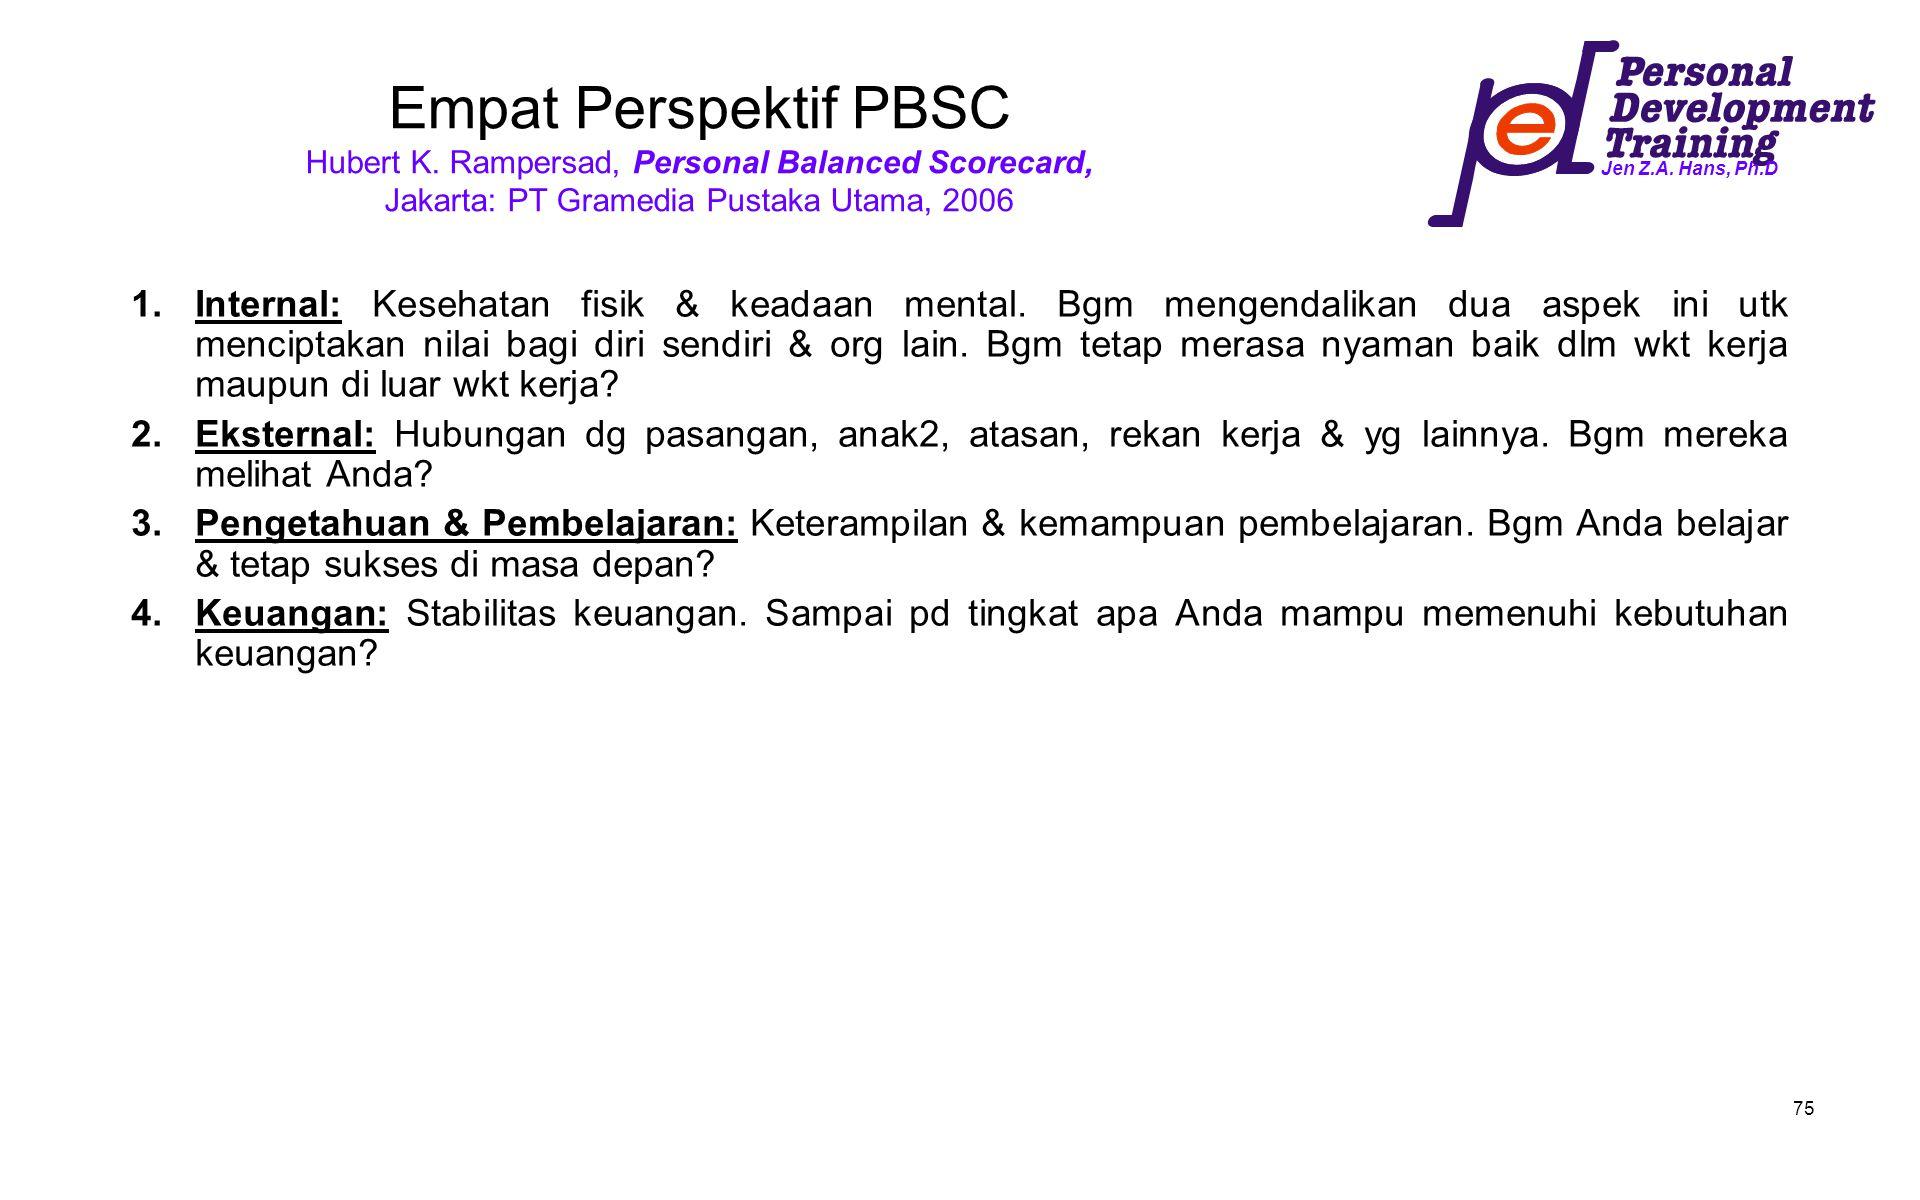 Jen Z.A. Hans, Ph.D 75 Empat Perspektif PBSC Hubert K. Rampersad, Personal Balanced Scorecard, Jakarta: PT Gramedia Pustaka Utama, 2006 1.Internal: Ke